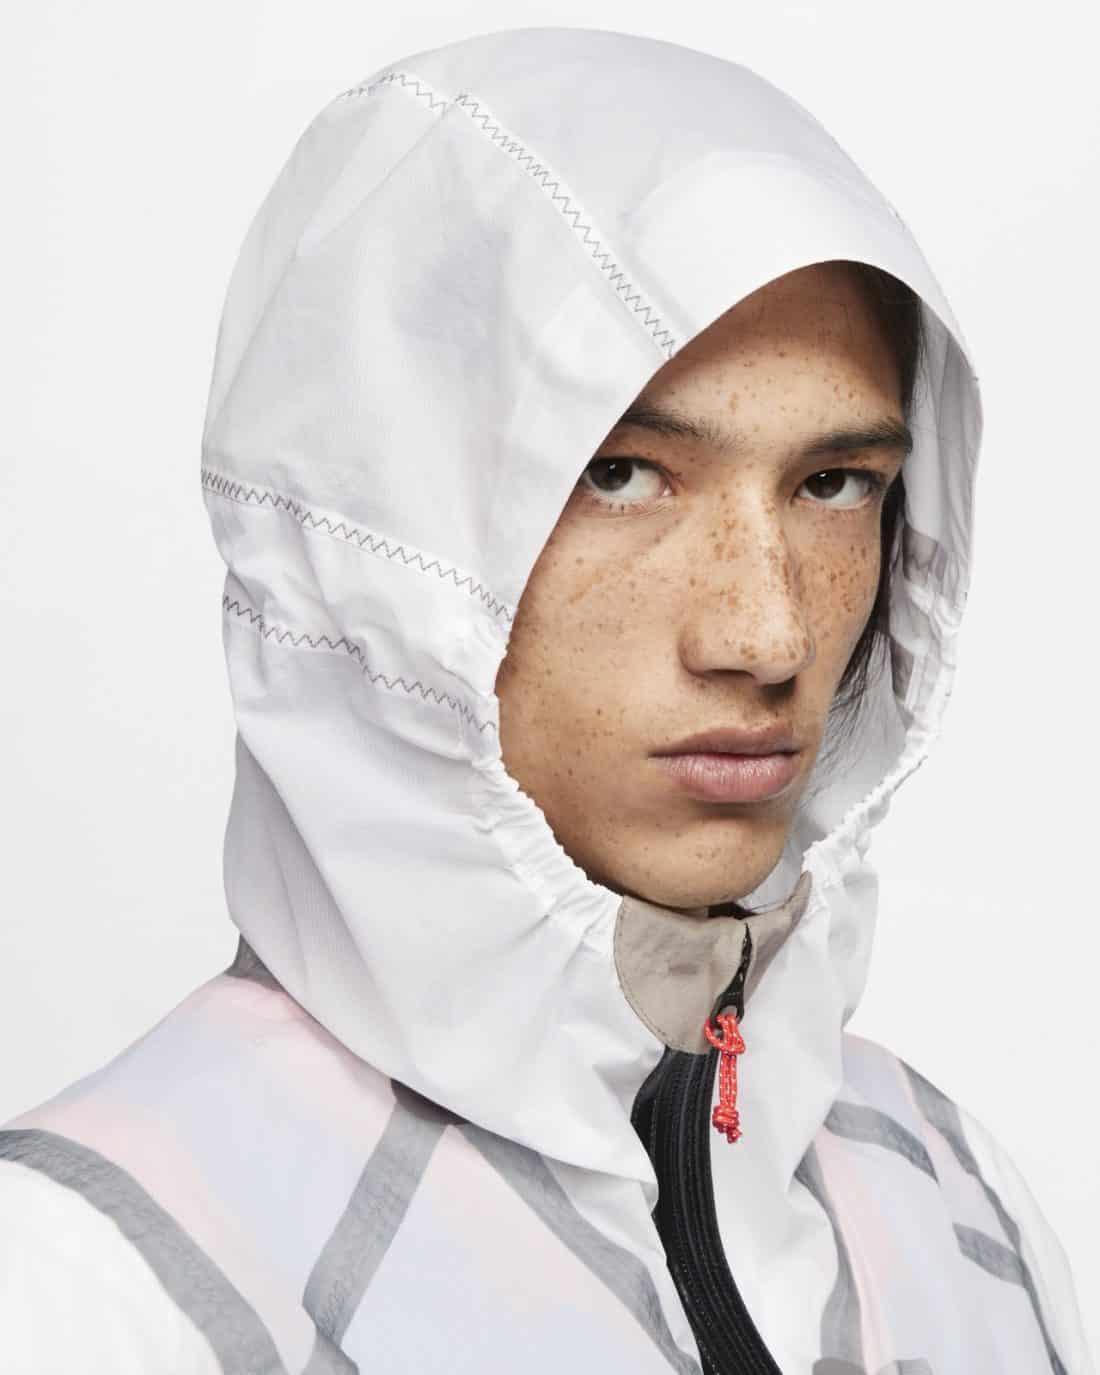 Nike ISPA Inflate Jacket - Le Site de la Sneaker